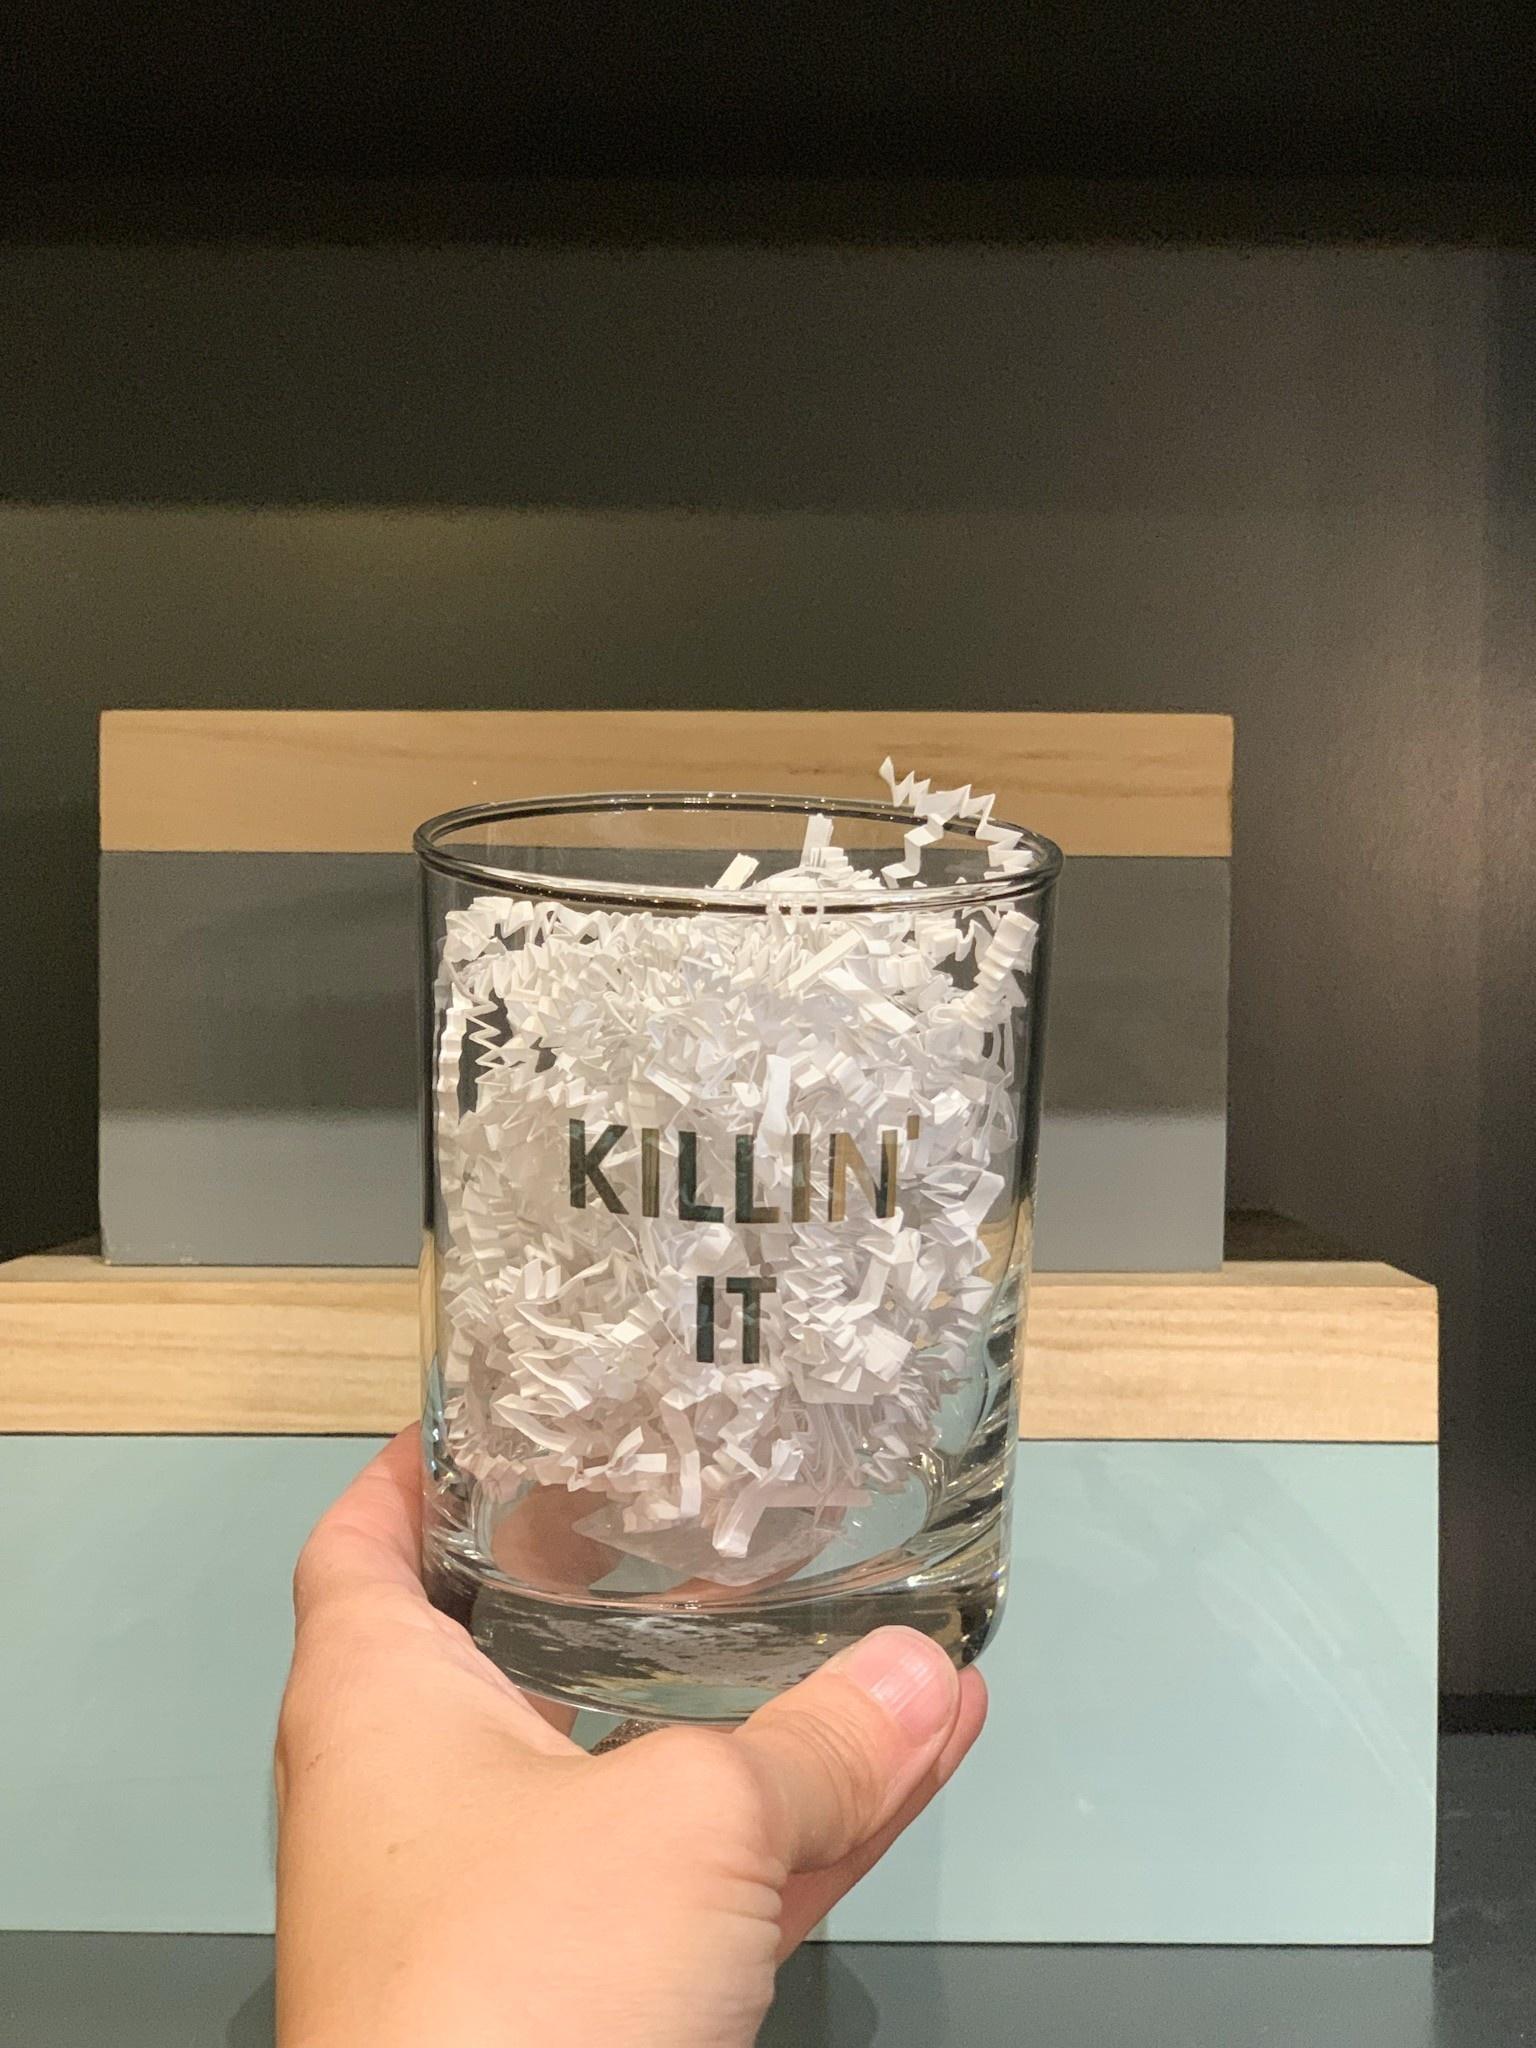 Chez Gagne Killin' it rocks glass